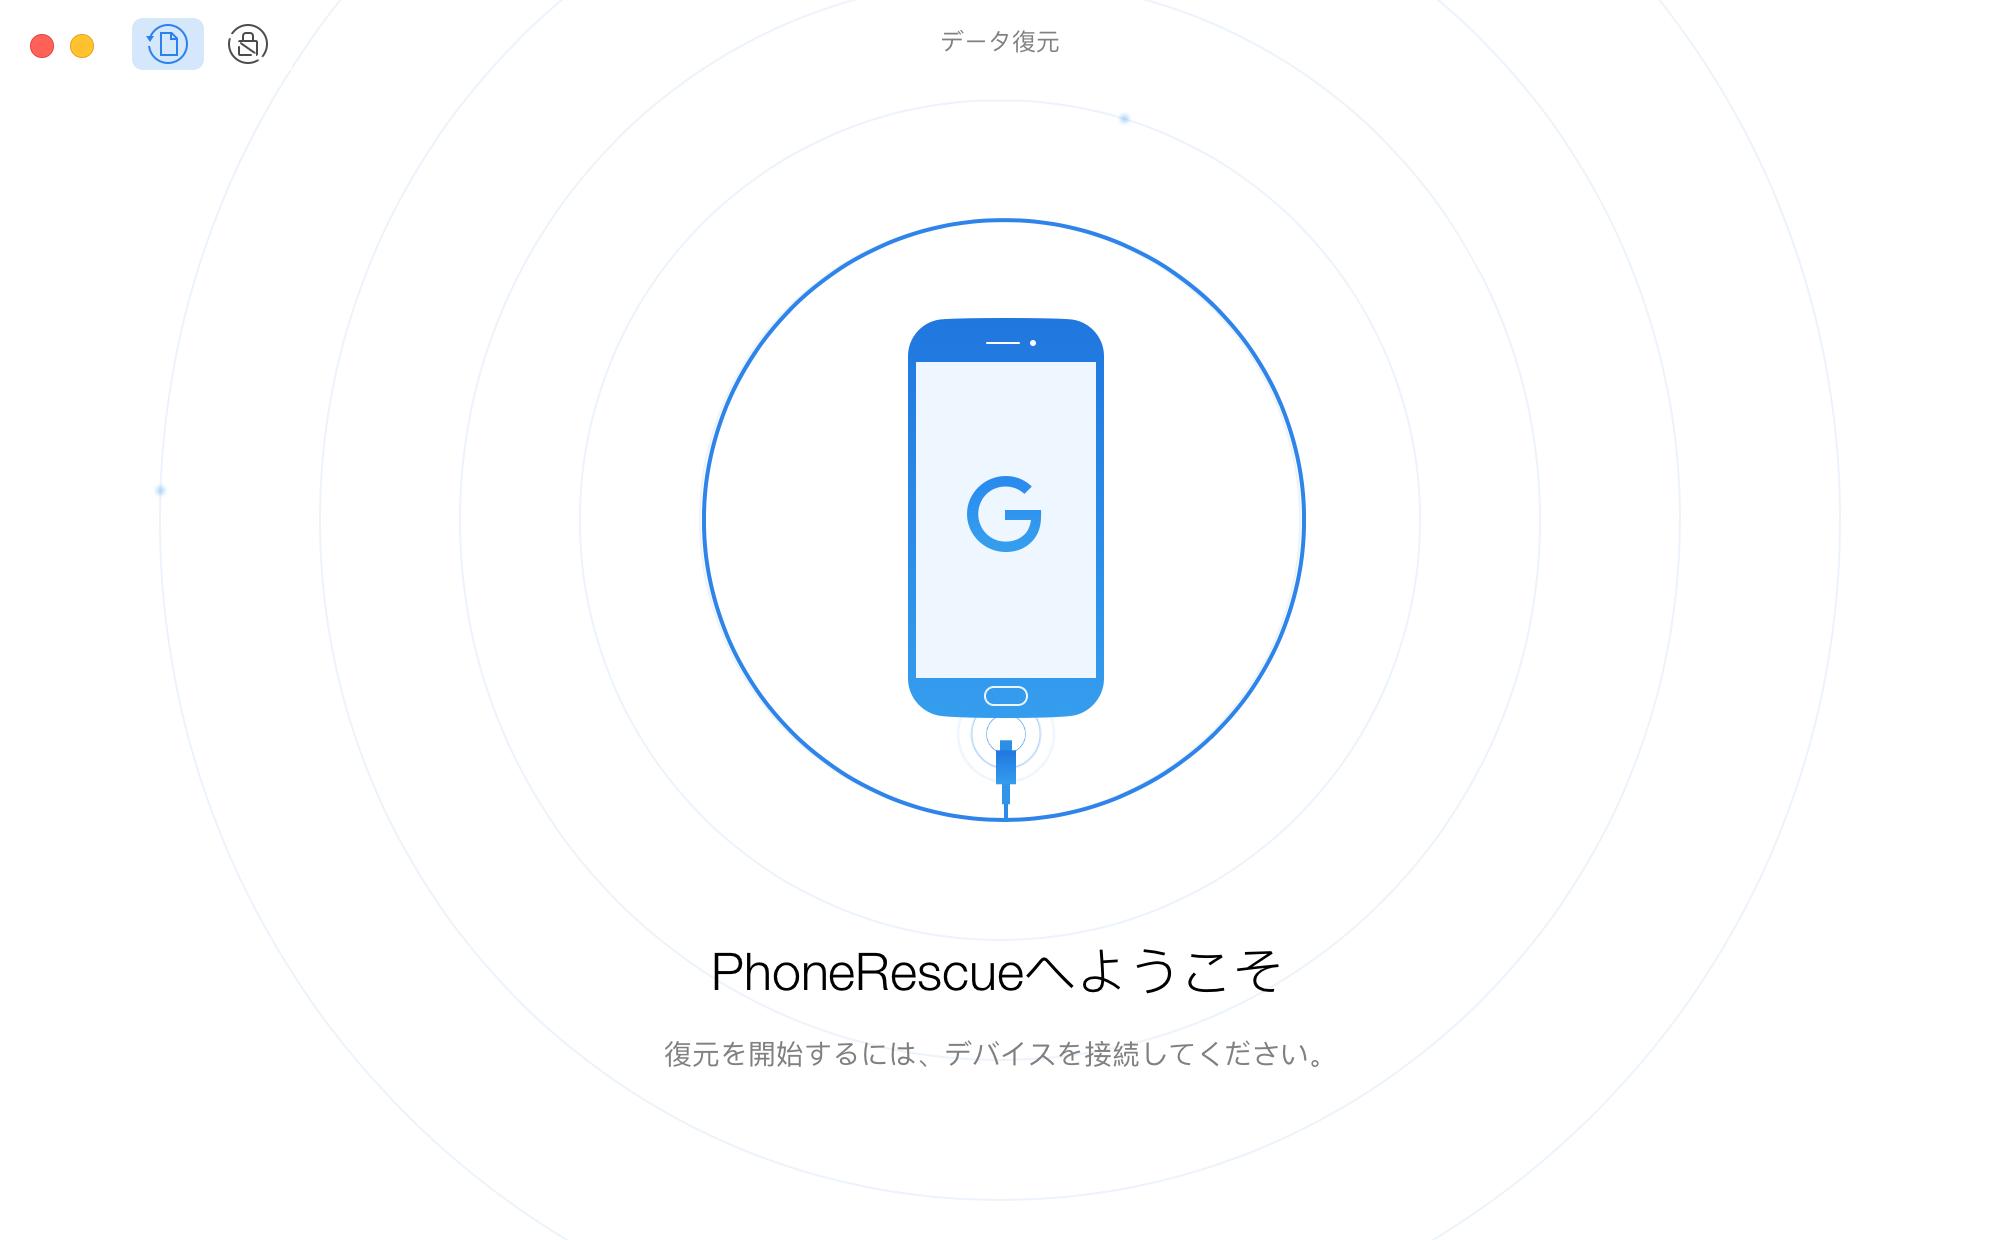 PhoneRescue - Googleデータ復元のウェルカムインターフェイス